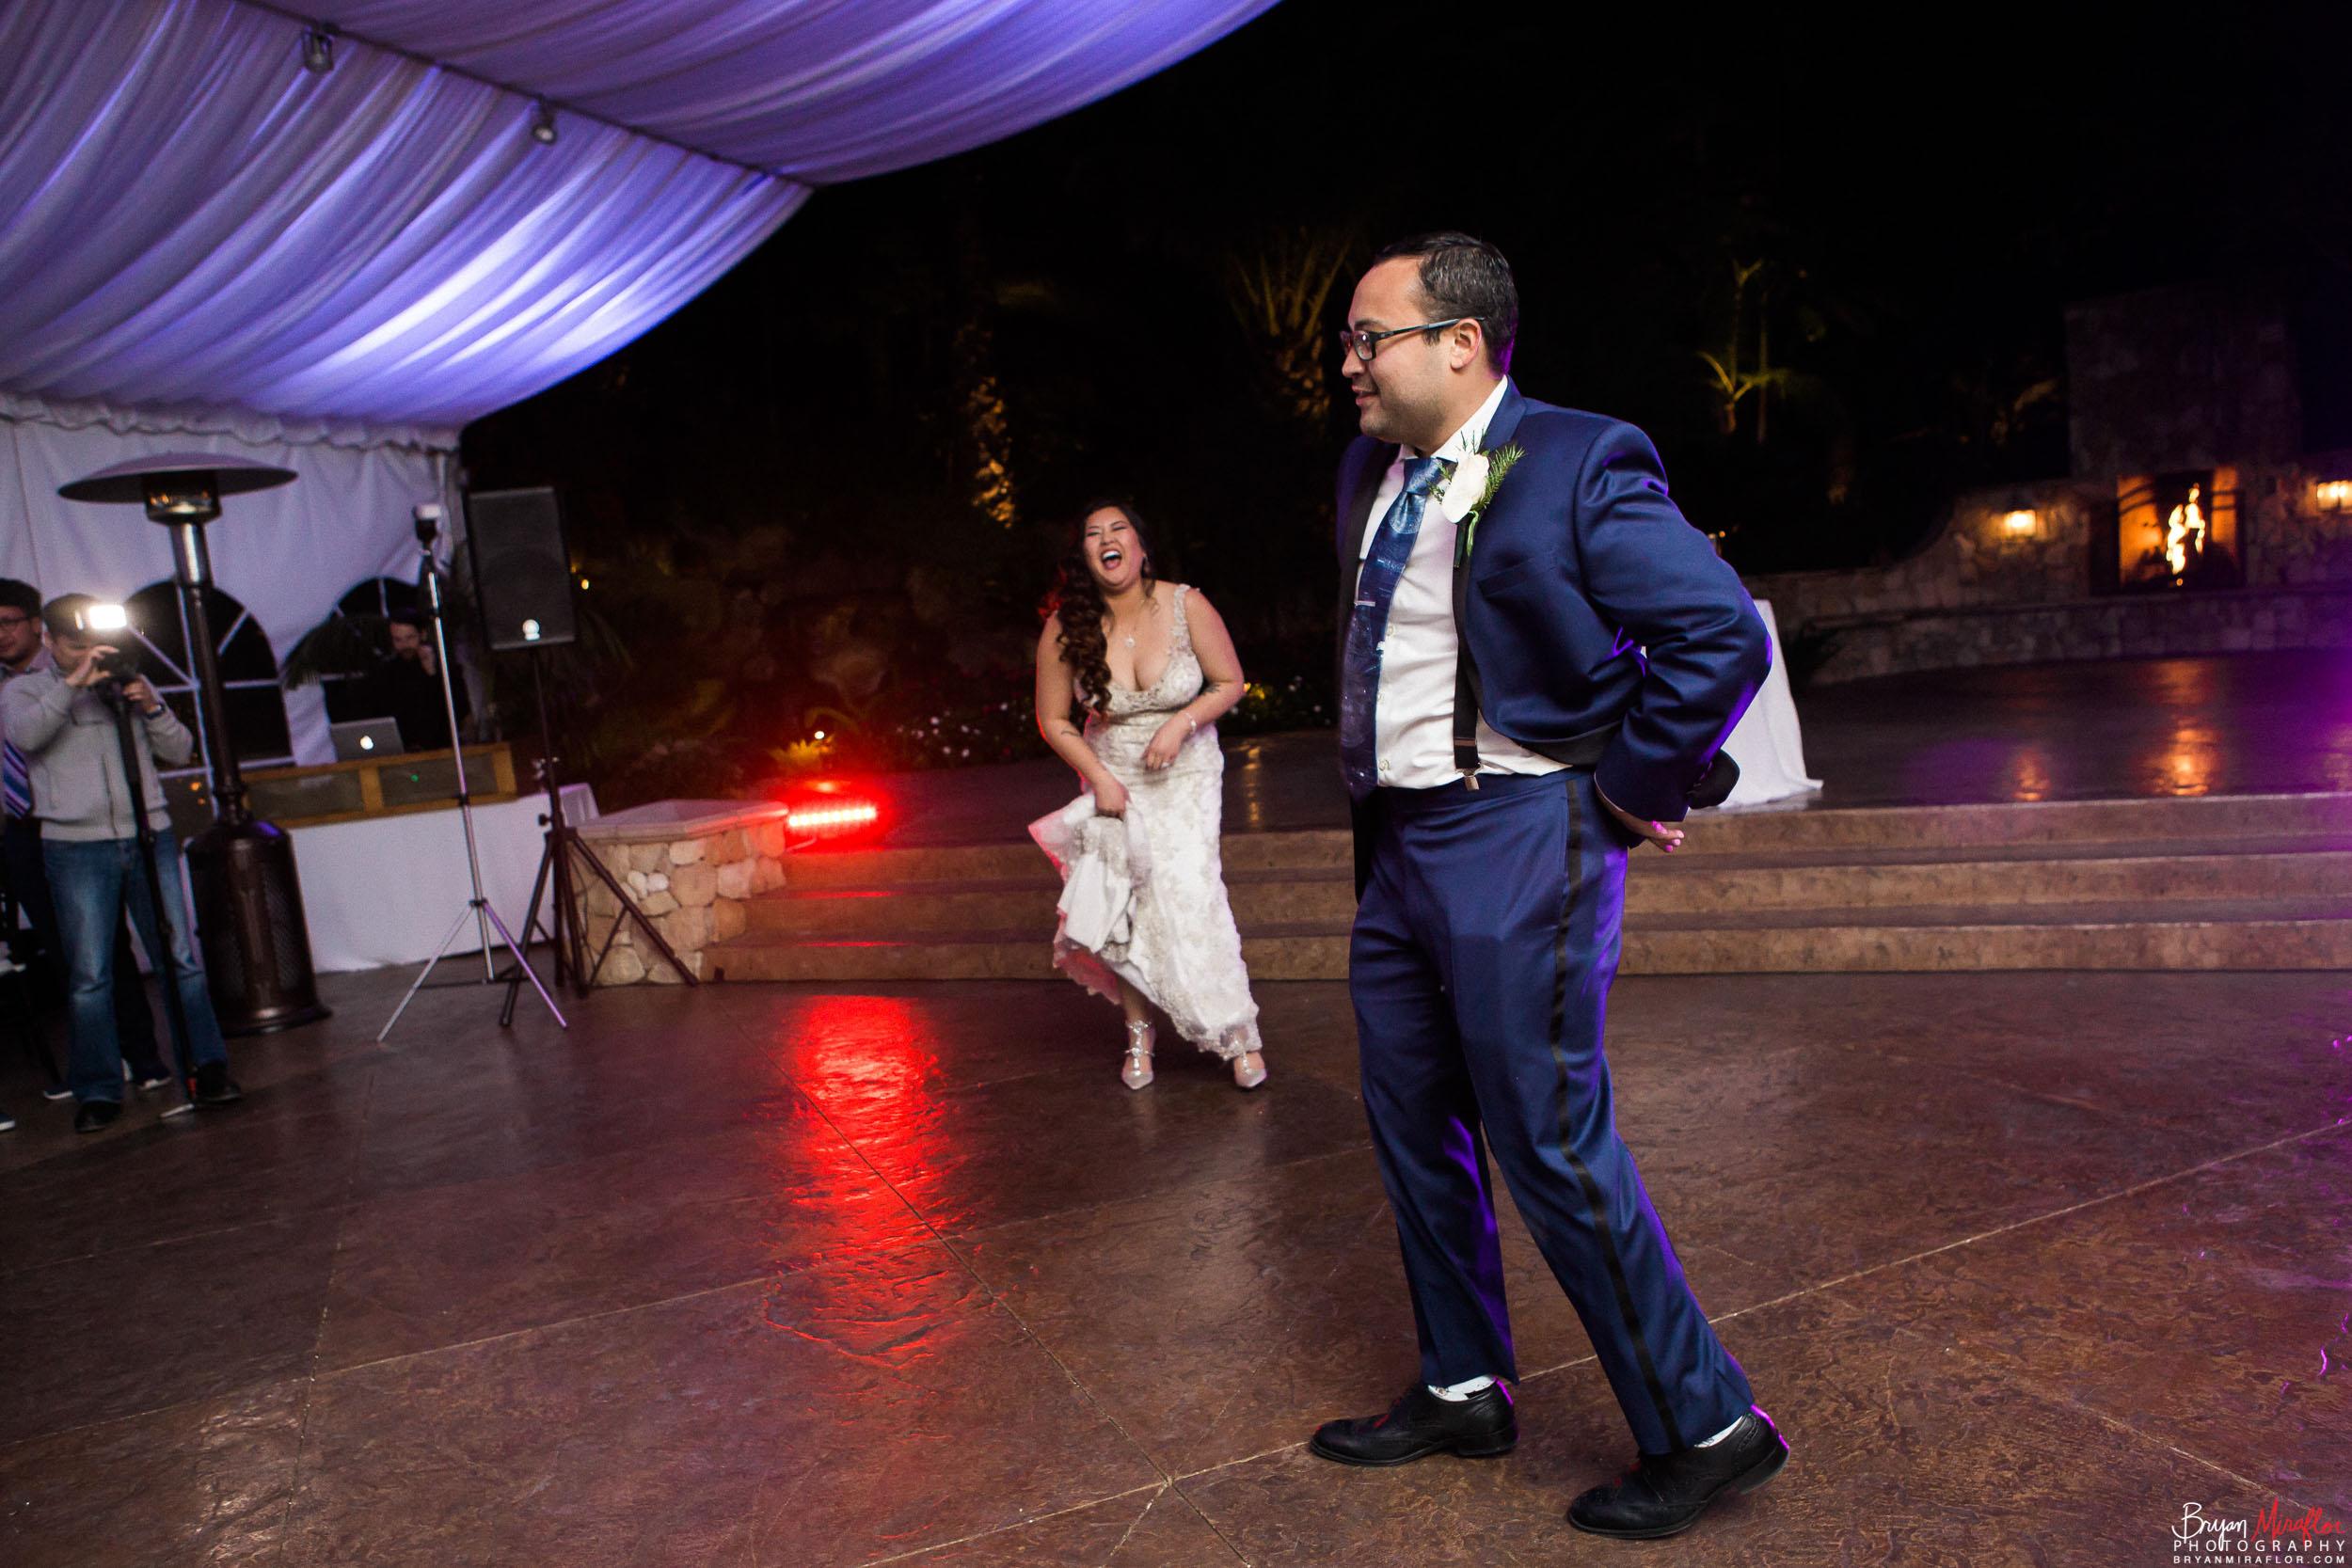 Bryan-Miraflor-Photography-Hannah-Jonathan-Married-Grand-Traditions-Estate-Gardens-Fallbrook-20171222-217.jpg